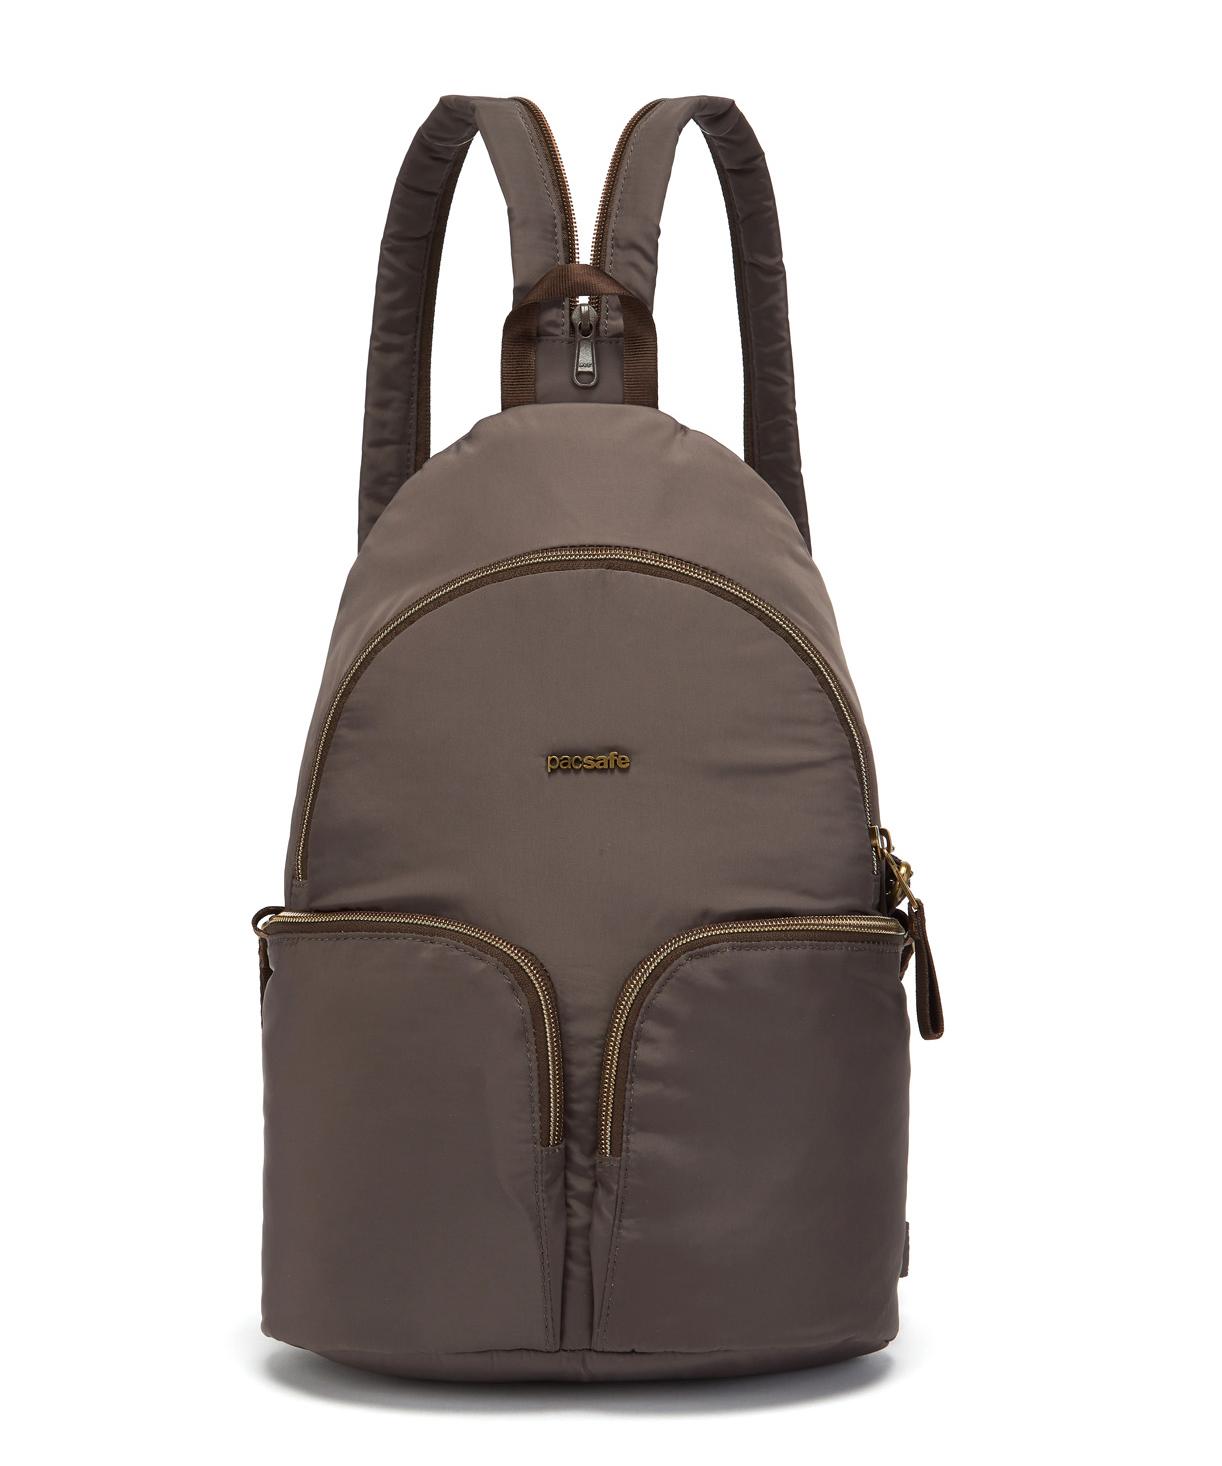 30% Off Stylesafe sling backpack